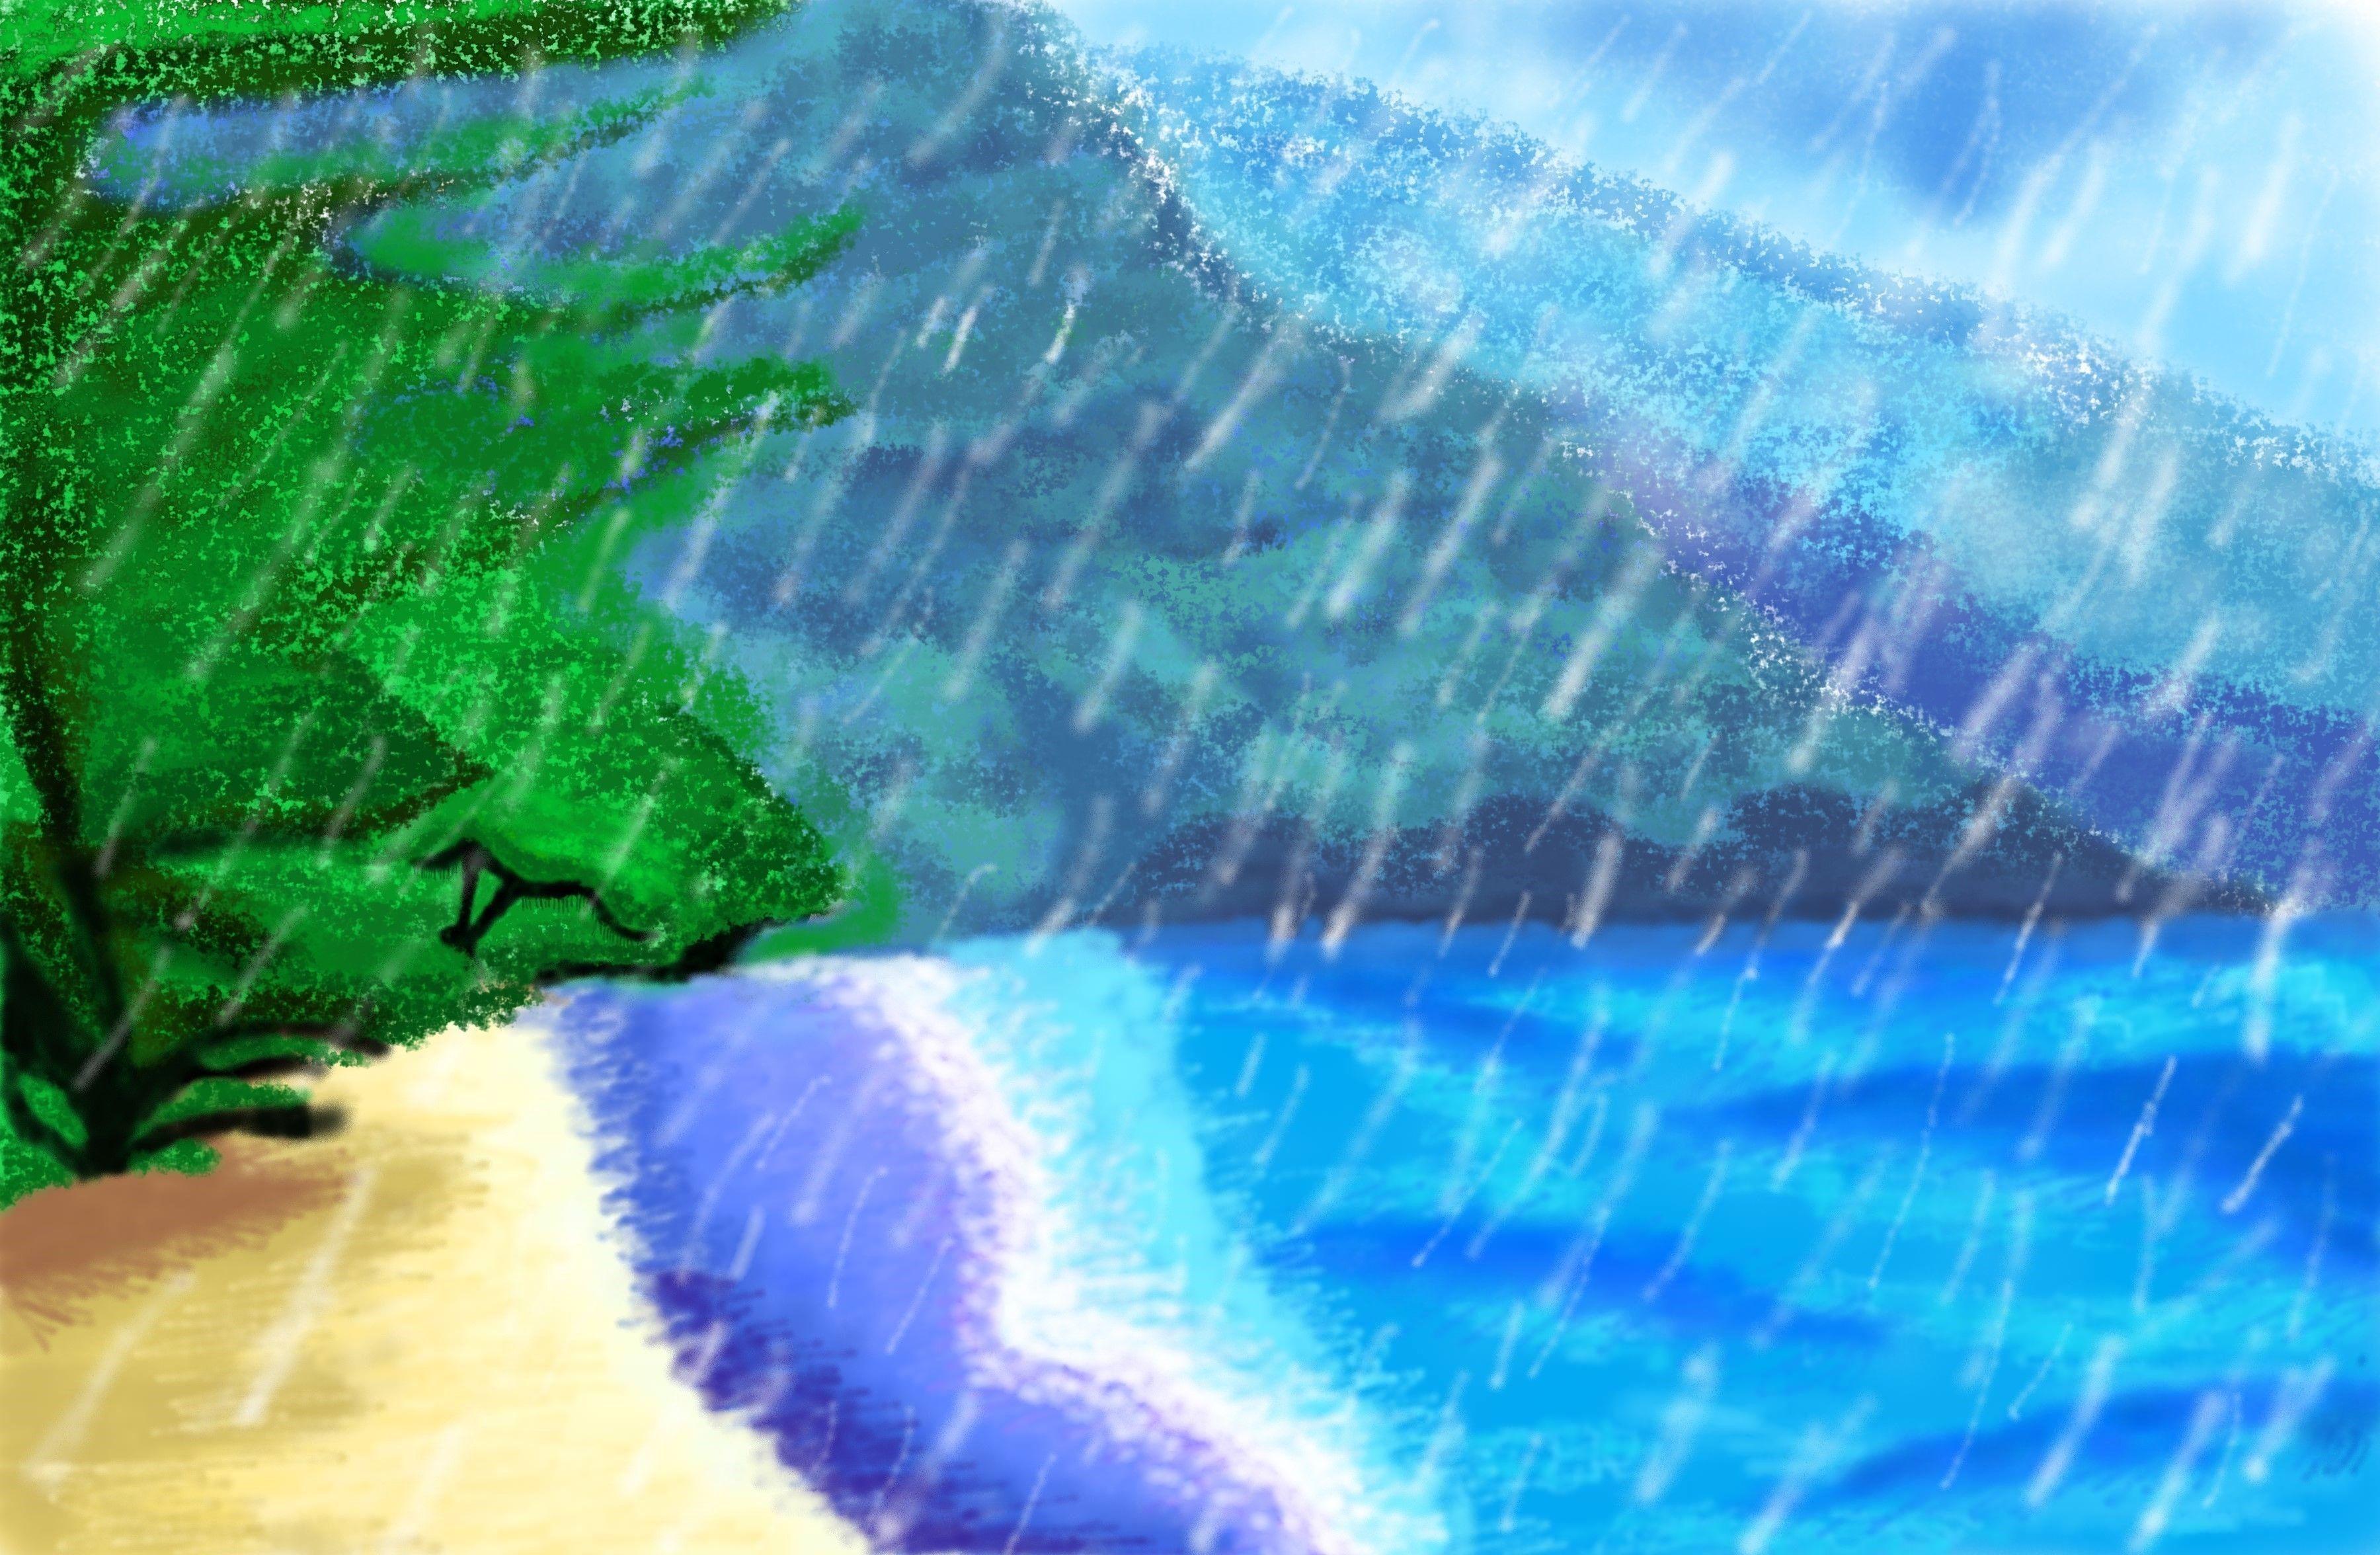 Summer Sorrows Paint 3D [3600X2352Px]